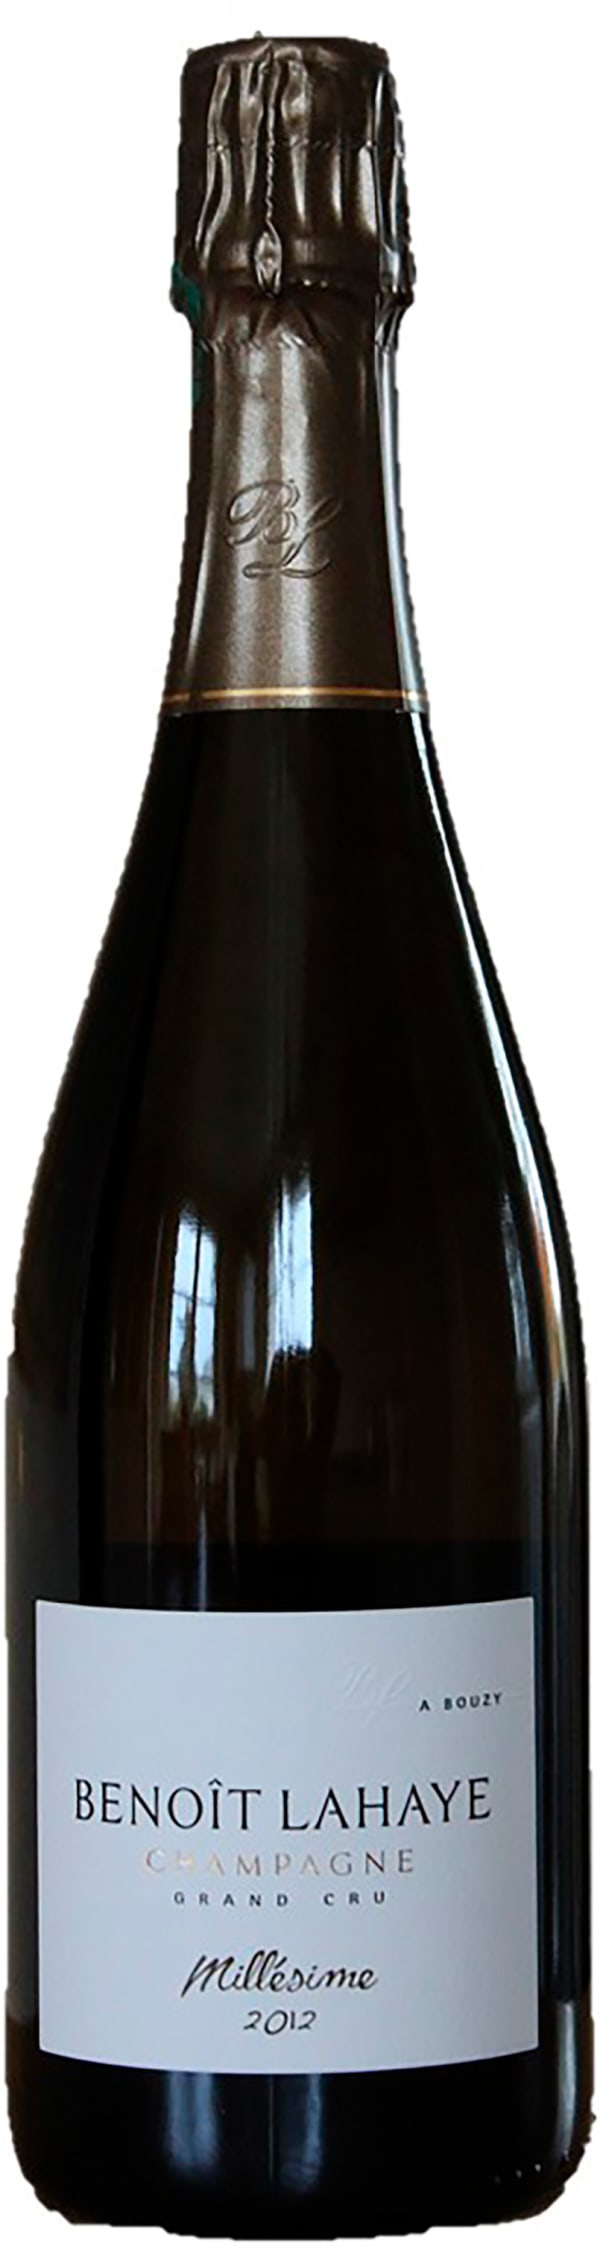 Benoit Lahaye Grand Cru Millésime Champagne Extra Brut 2012